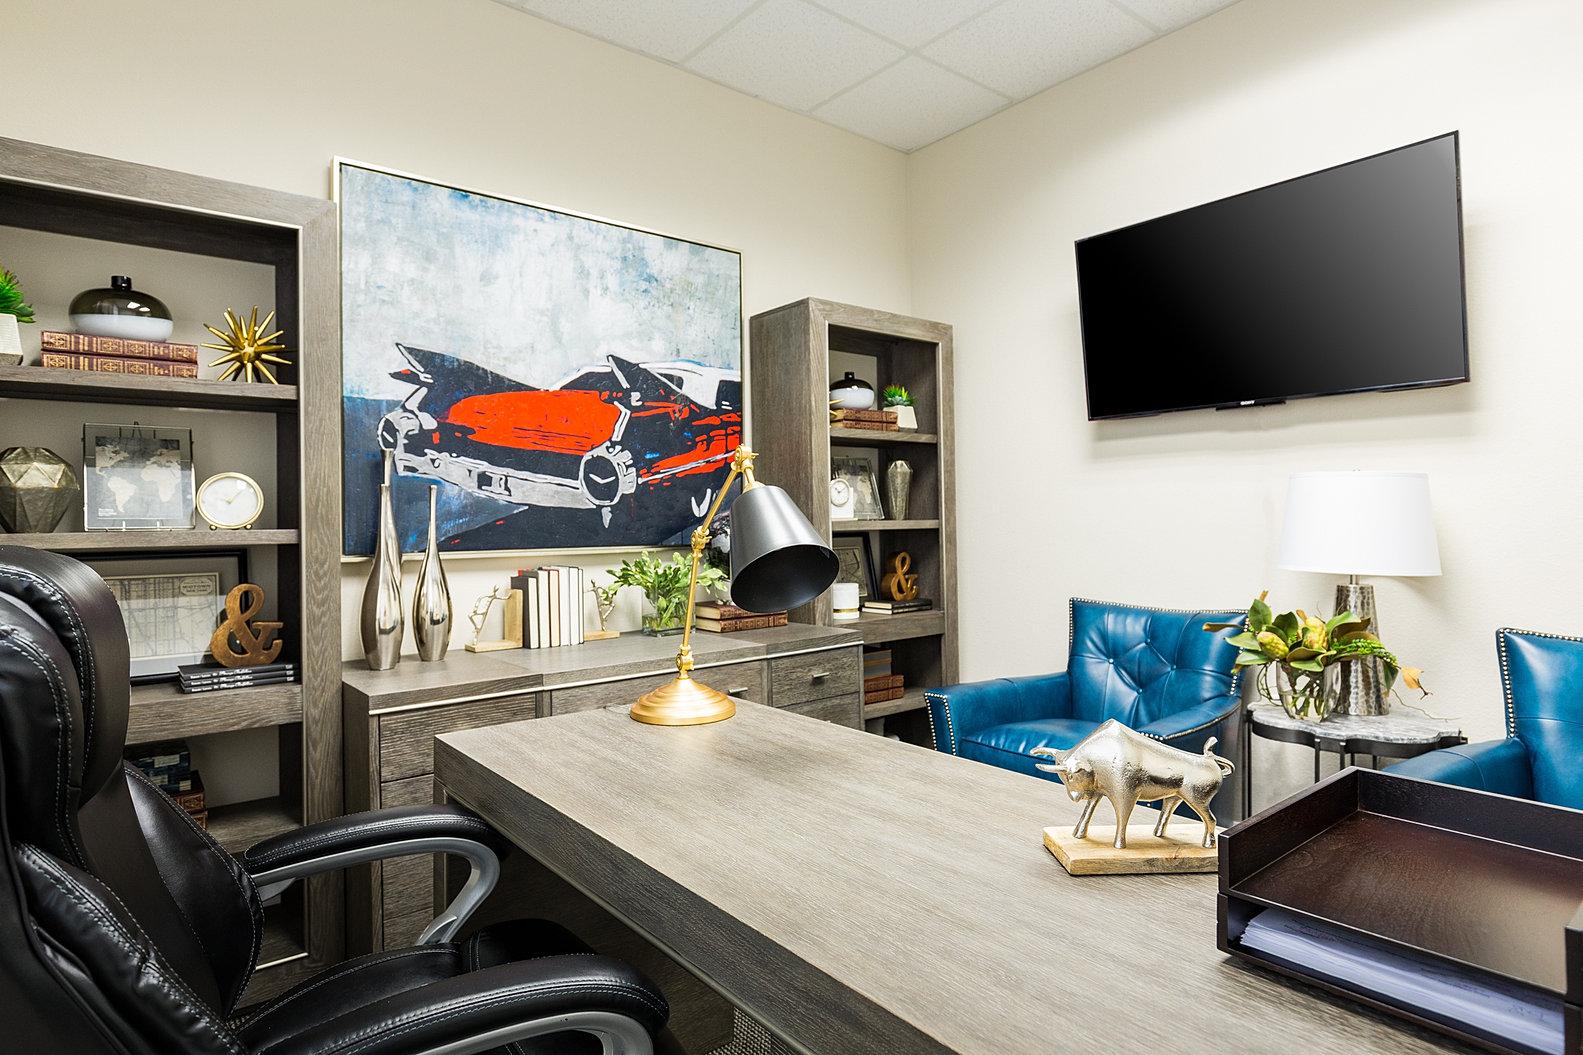 Interior Design Jobs In Katy Texas